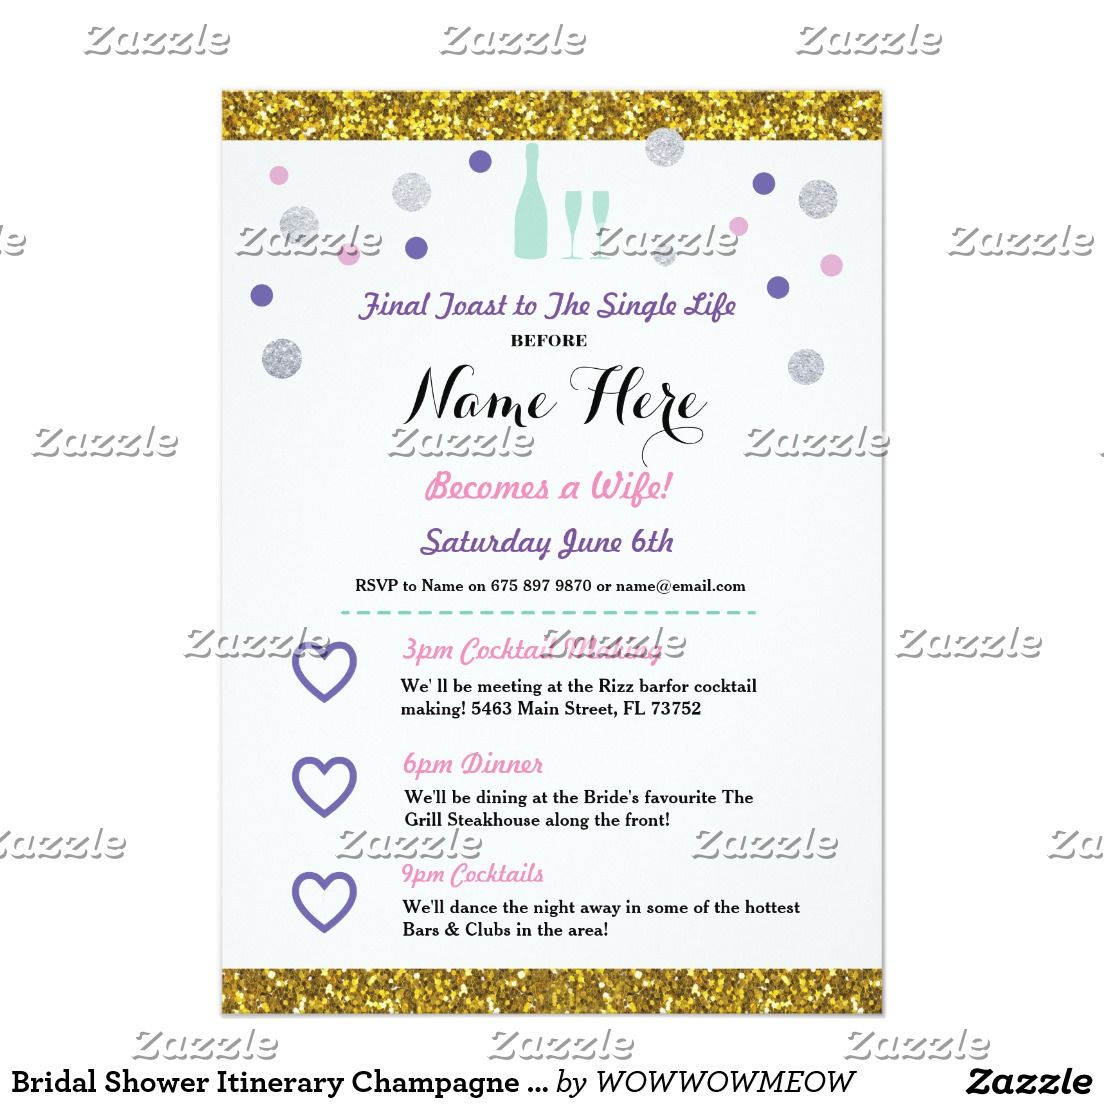 Bridal Shower Itinerary Champagne Invitation Zazzle Com Wedding Itinerary Template Wedding Itinerary Wedding Weekend Itinerary